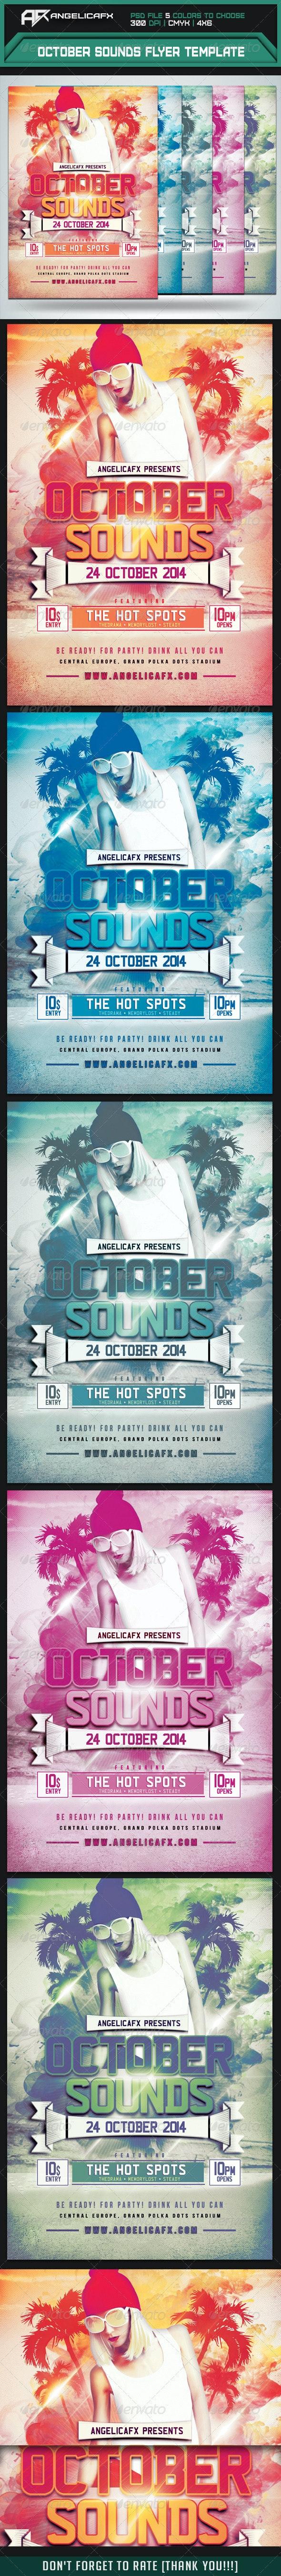 October Sounds Flyer Template - Flyers Print Templates